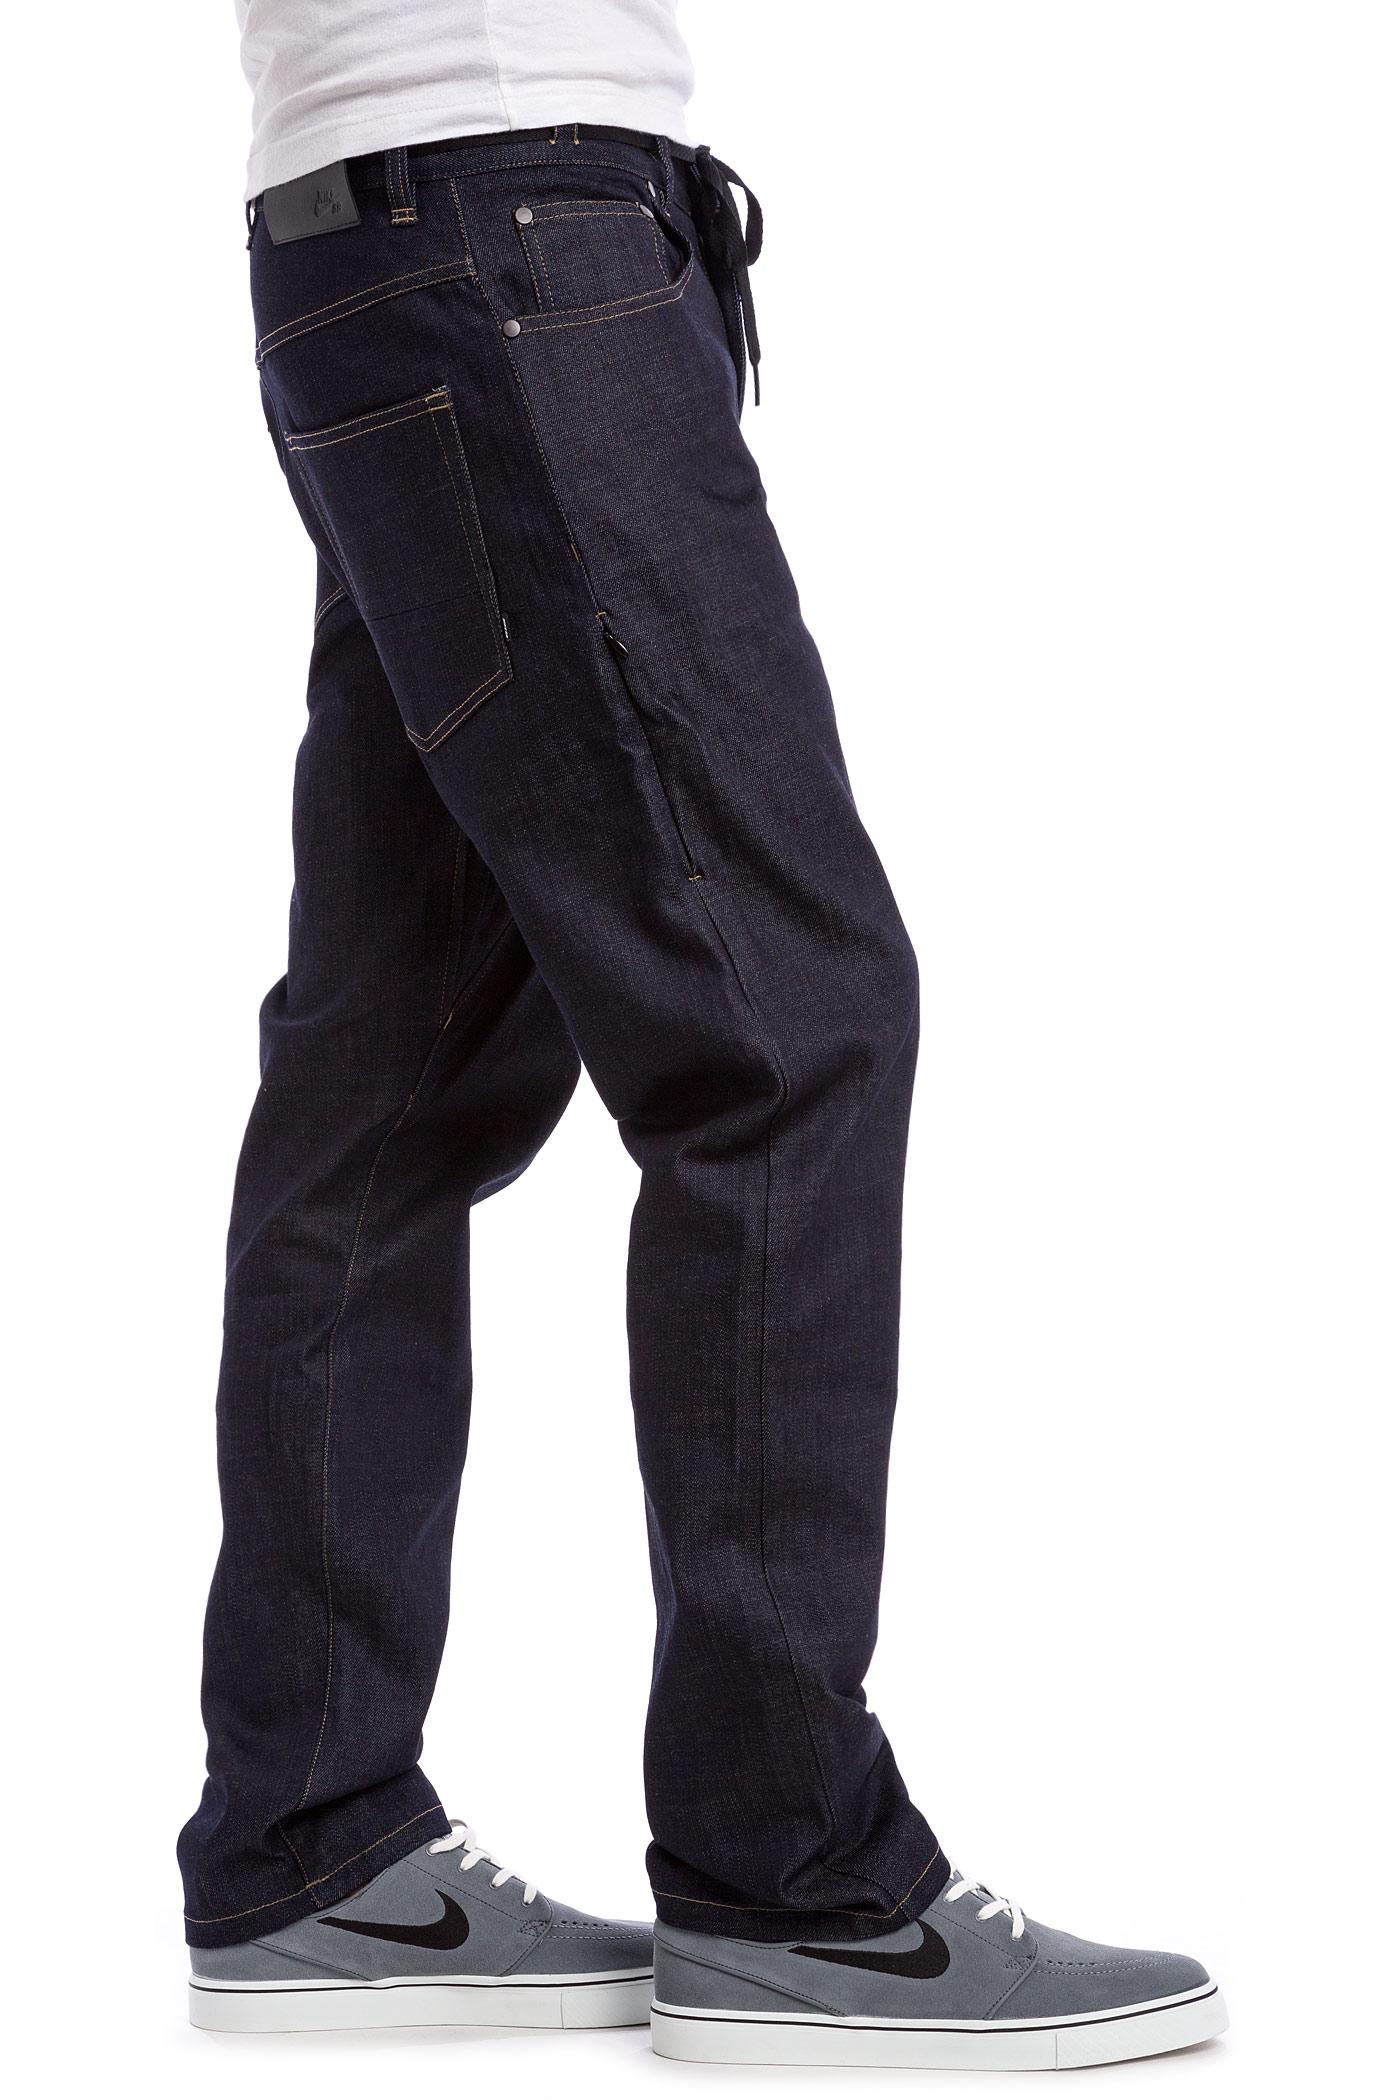 Nike SB FTM Blue Denim 5-Pocket Jeans (dark obsidian) buy at skatedeluxe 36c1e95ec6a0